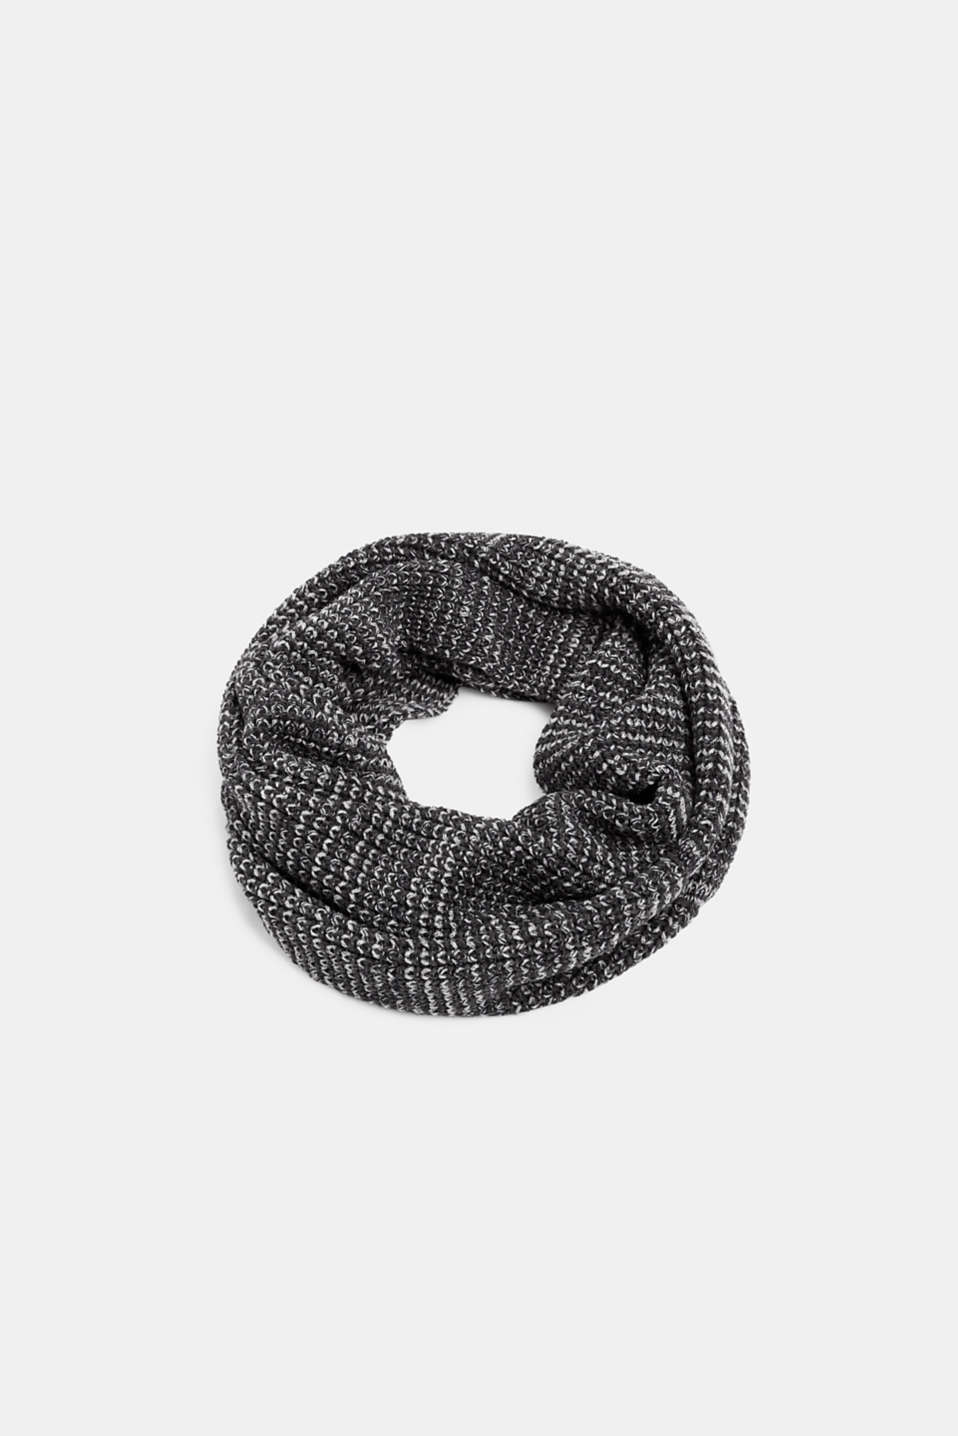 Textured knit snood, DARK GREY, detail image number 0